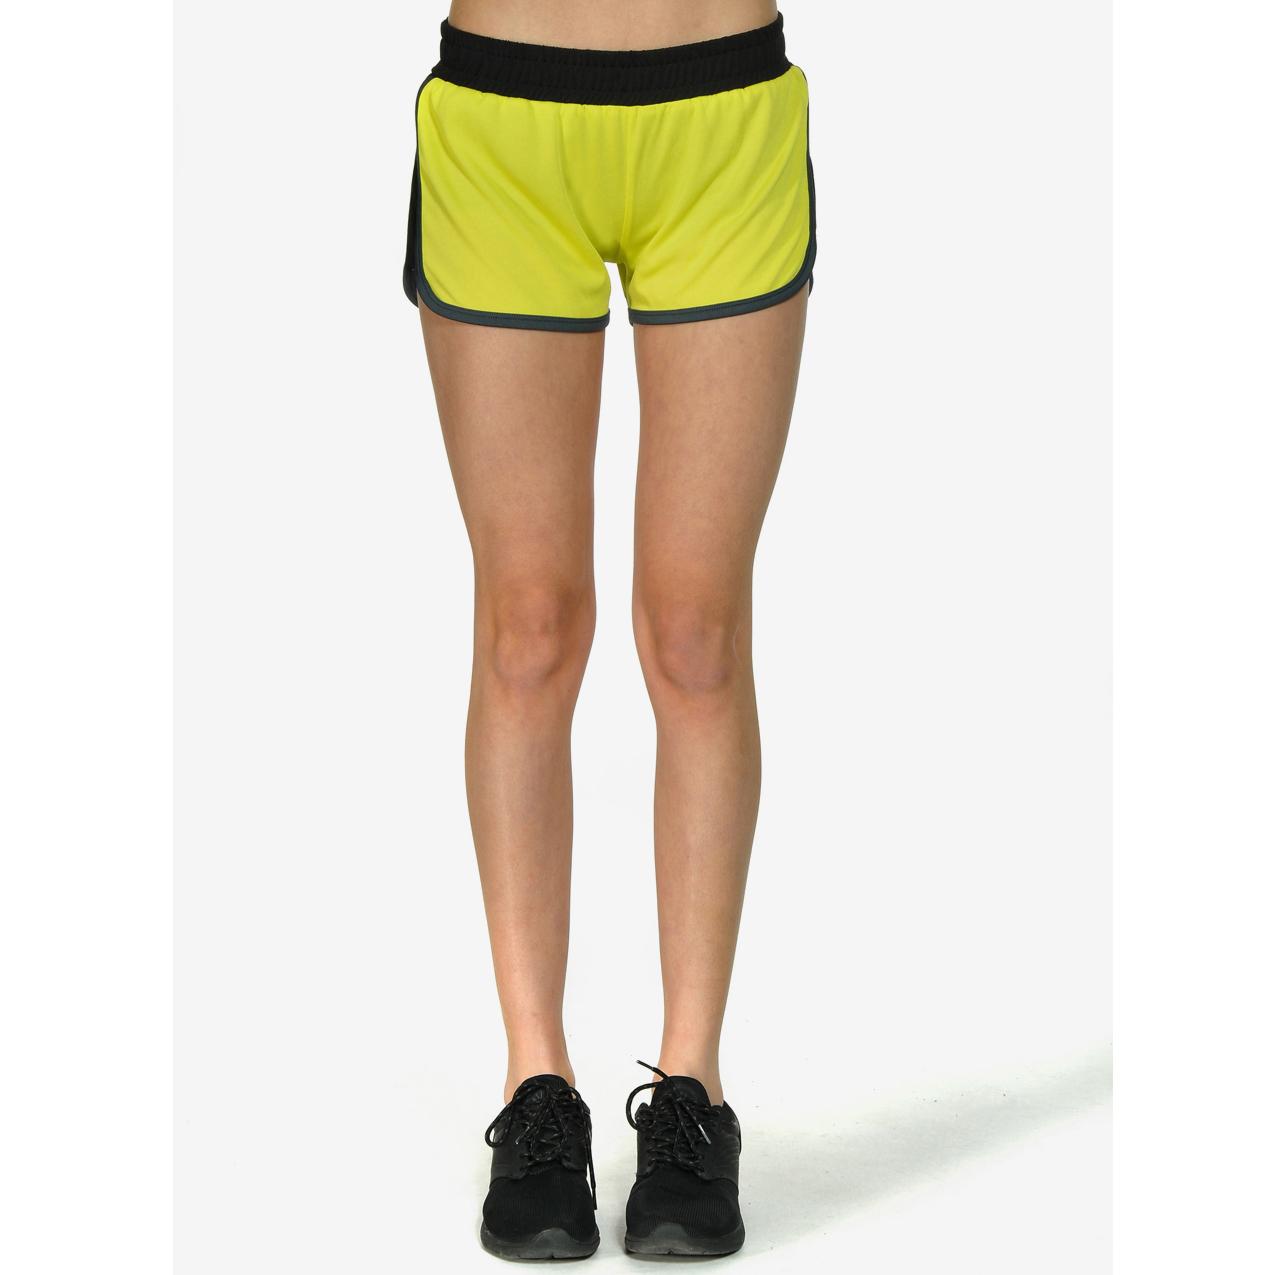 BODYTALK - Γυναικείο σορτς BODYTALK κίτρινο γυναικεία ρούχα σορτς βερμούδες αθλητικά